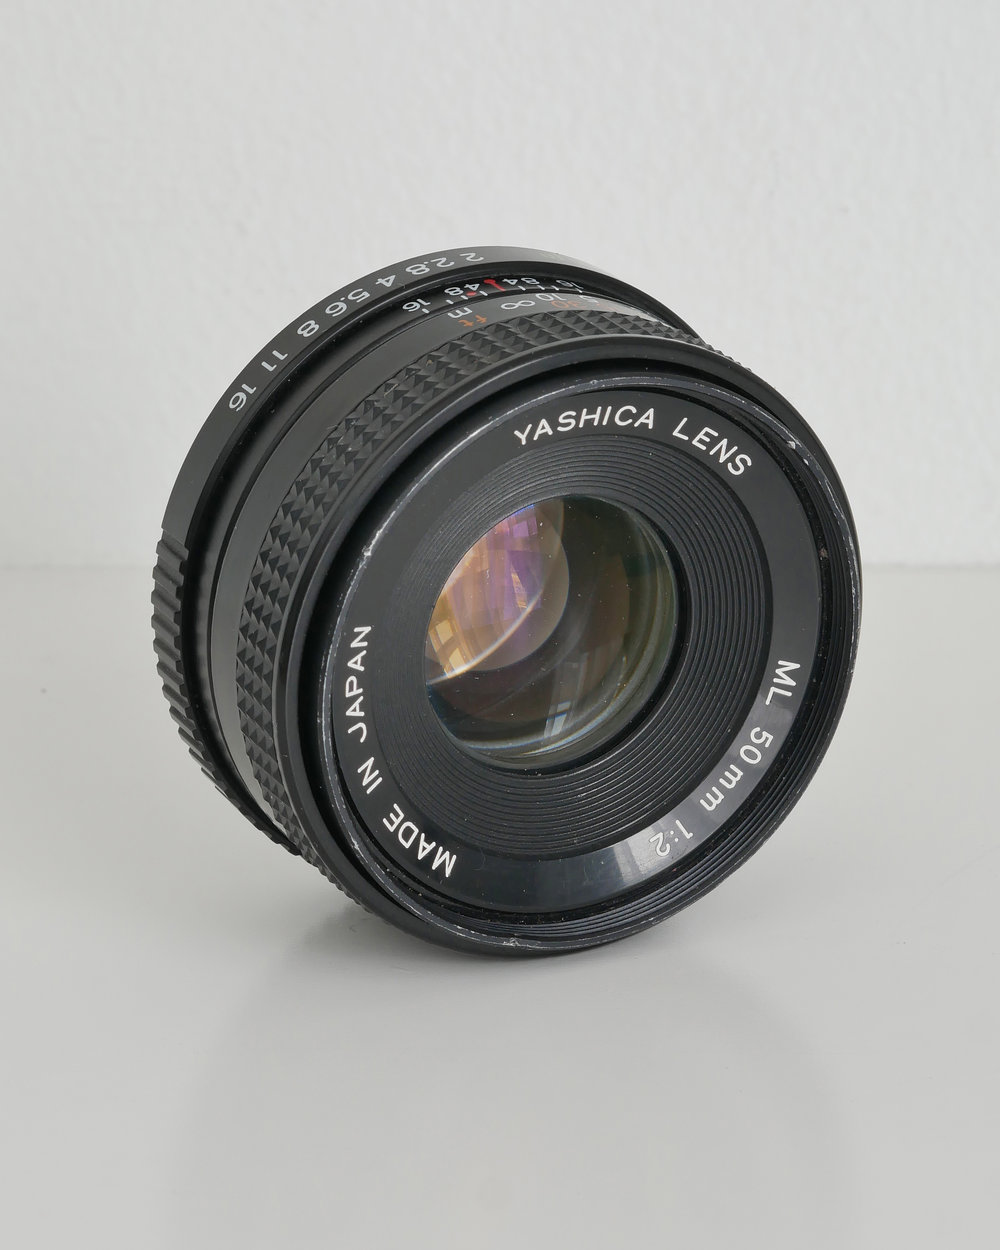 P1130691.JPG